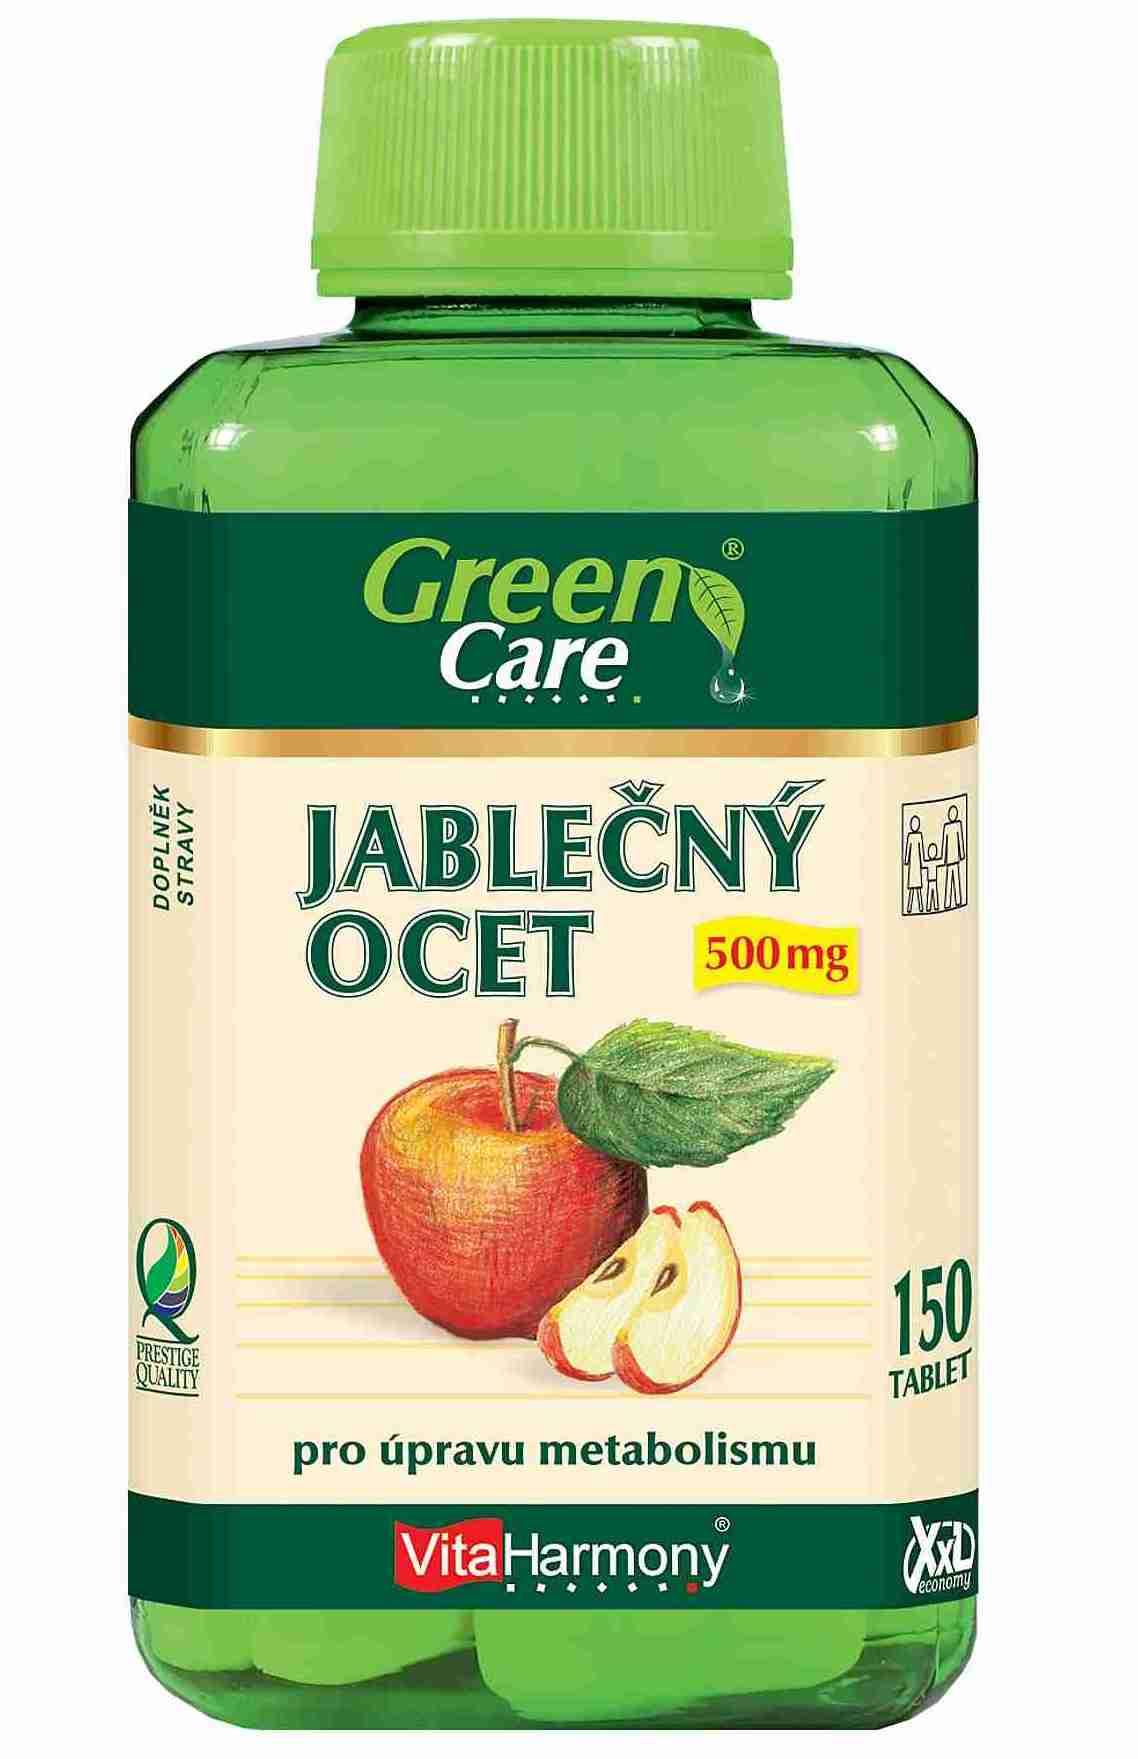 VitaHarmony Jablečný ocet 500 mg 150 tbl.